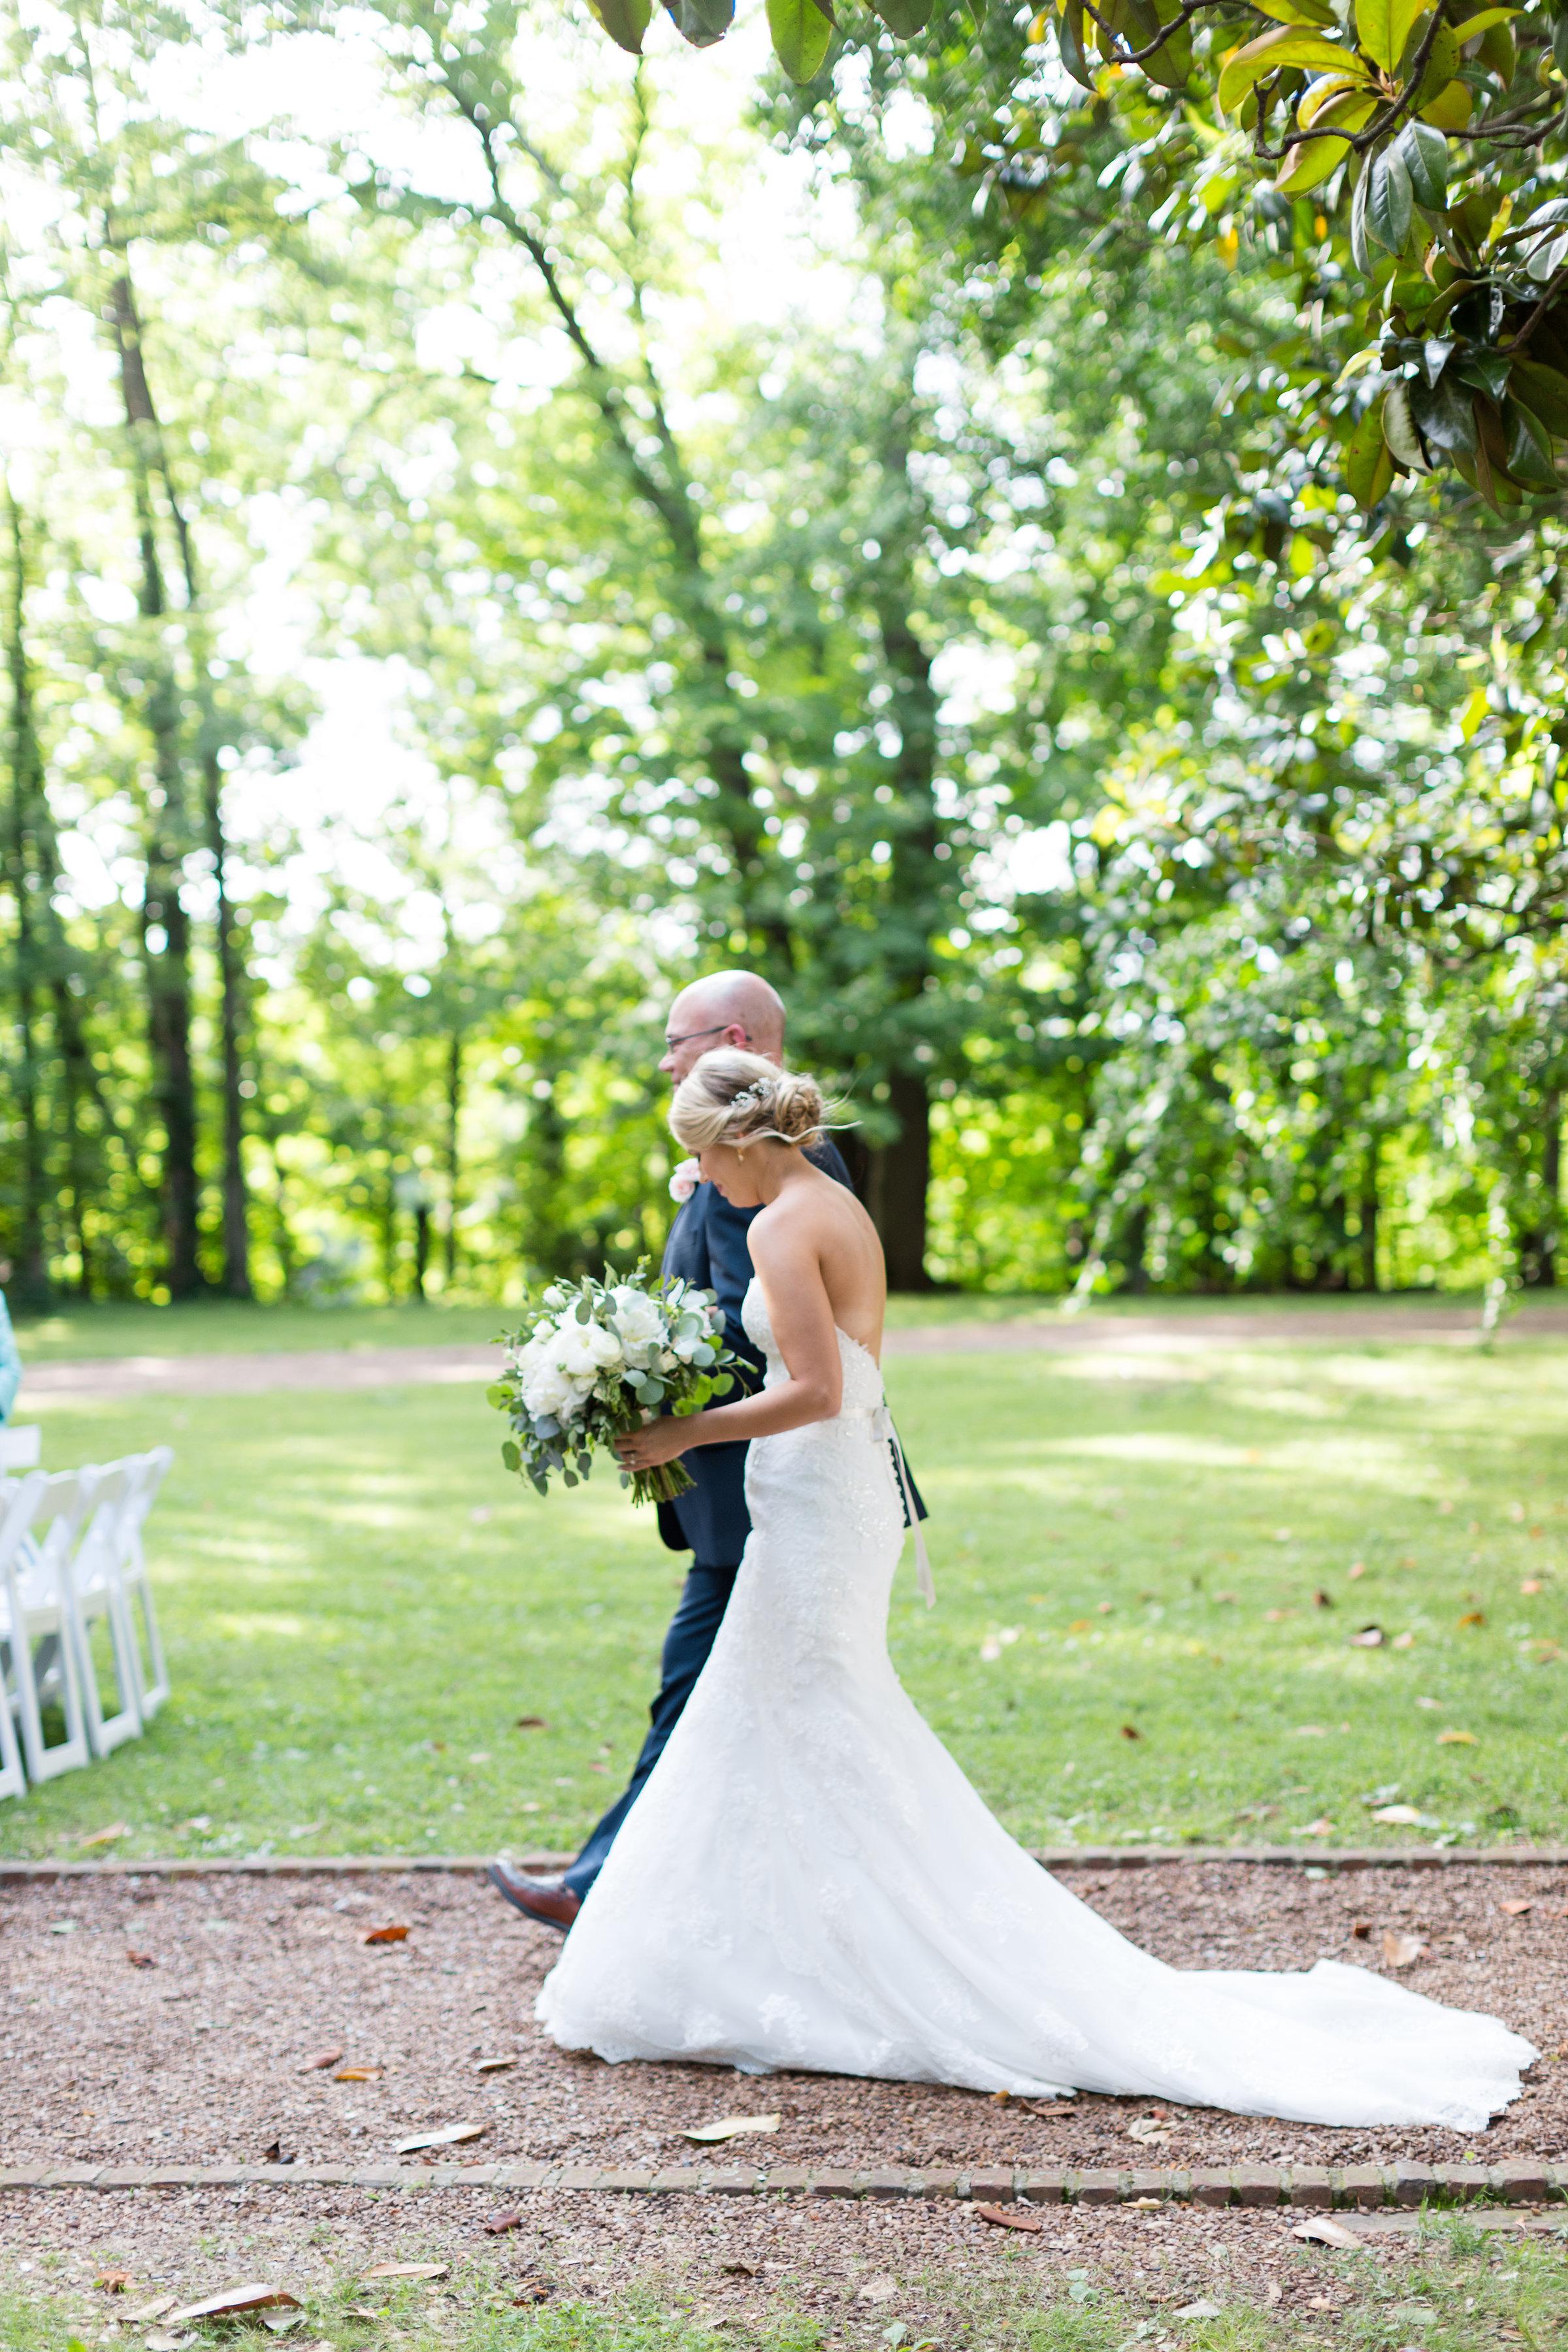 Swords_wedding-291.jpg